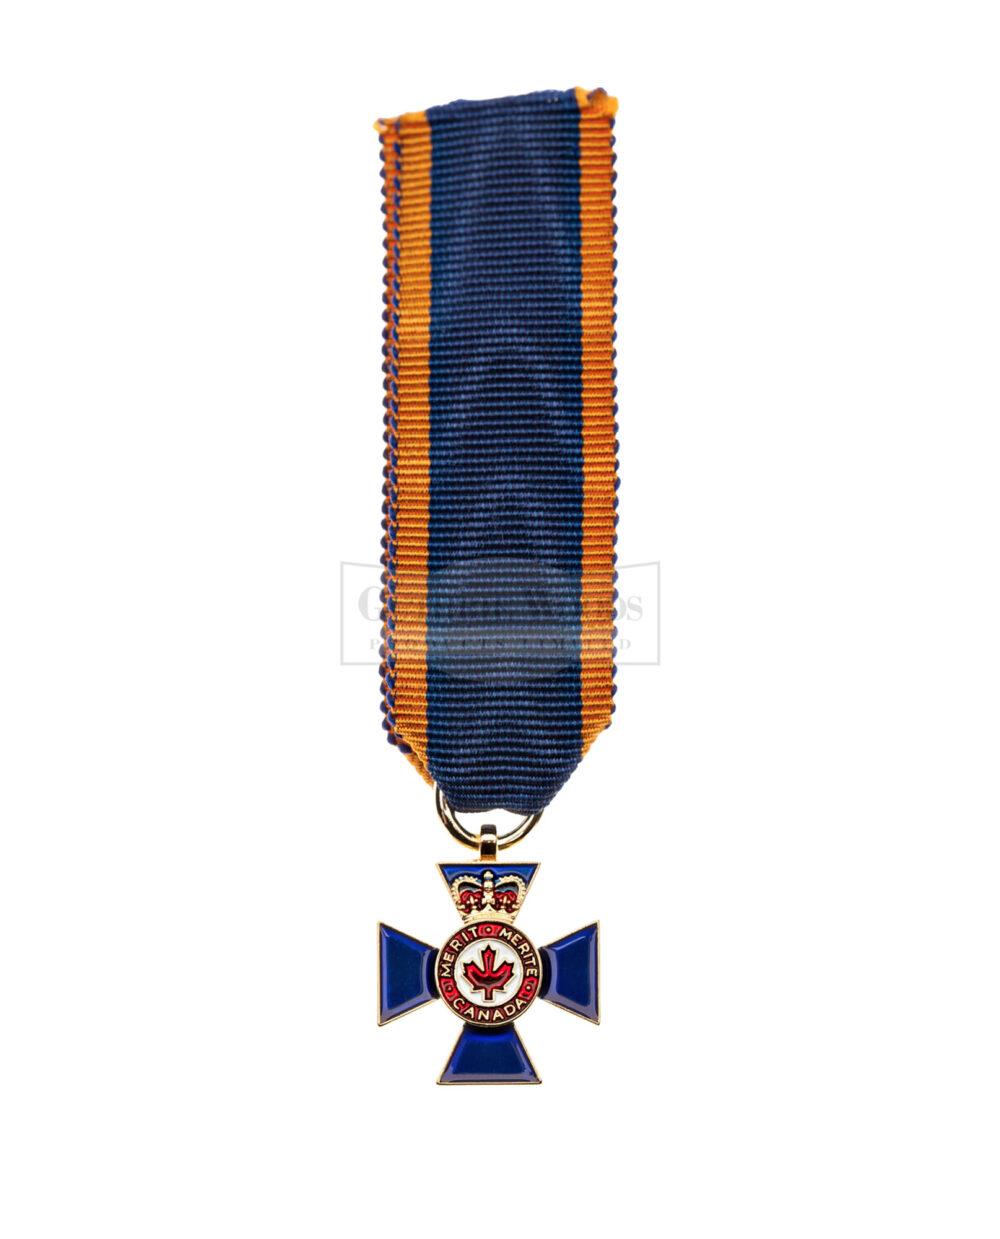 Order of Military Merit – Commander #224-C